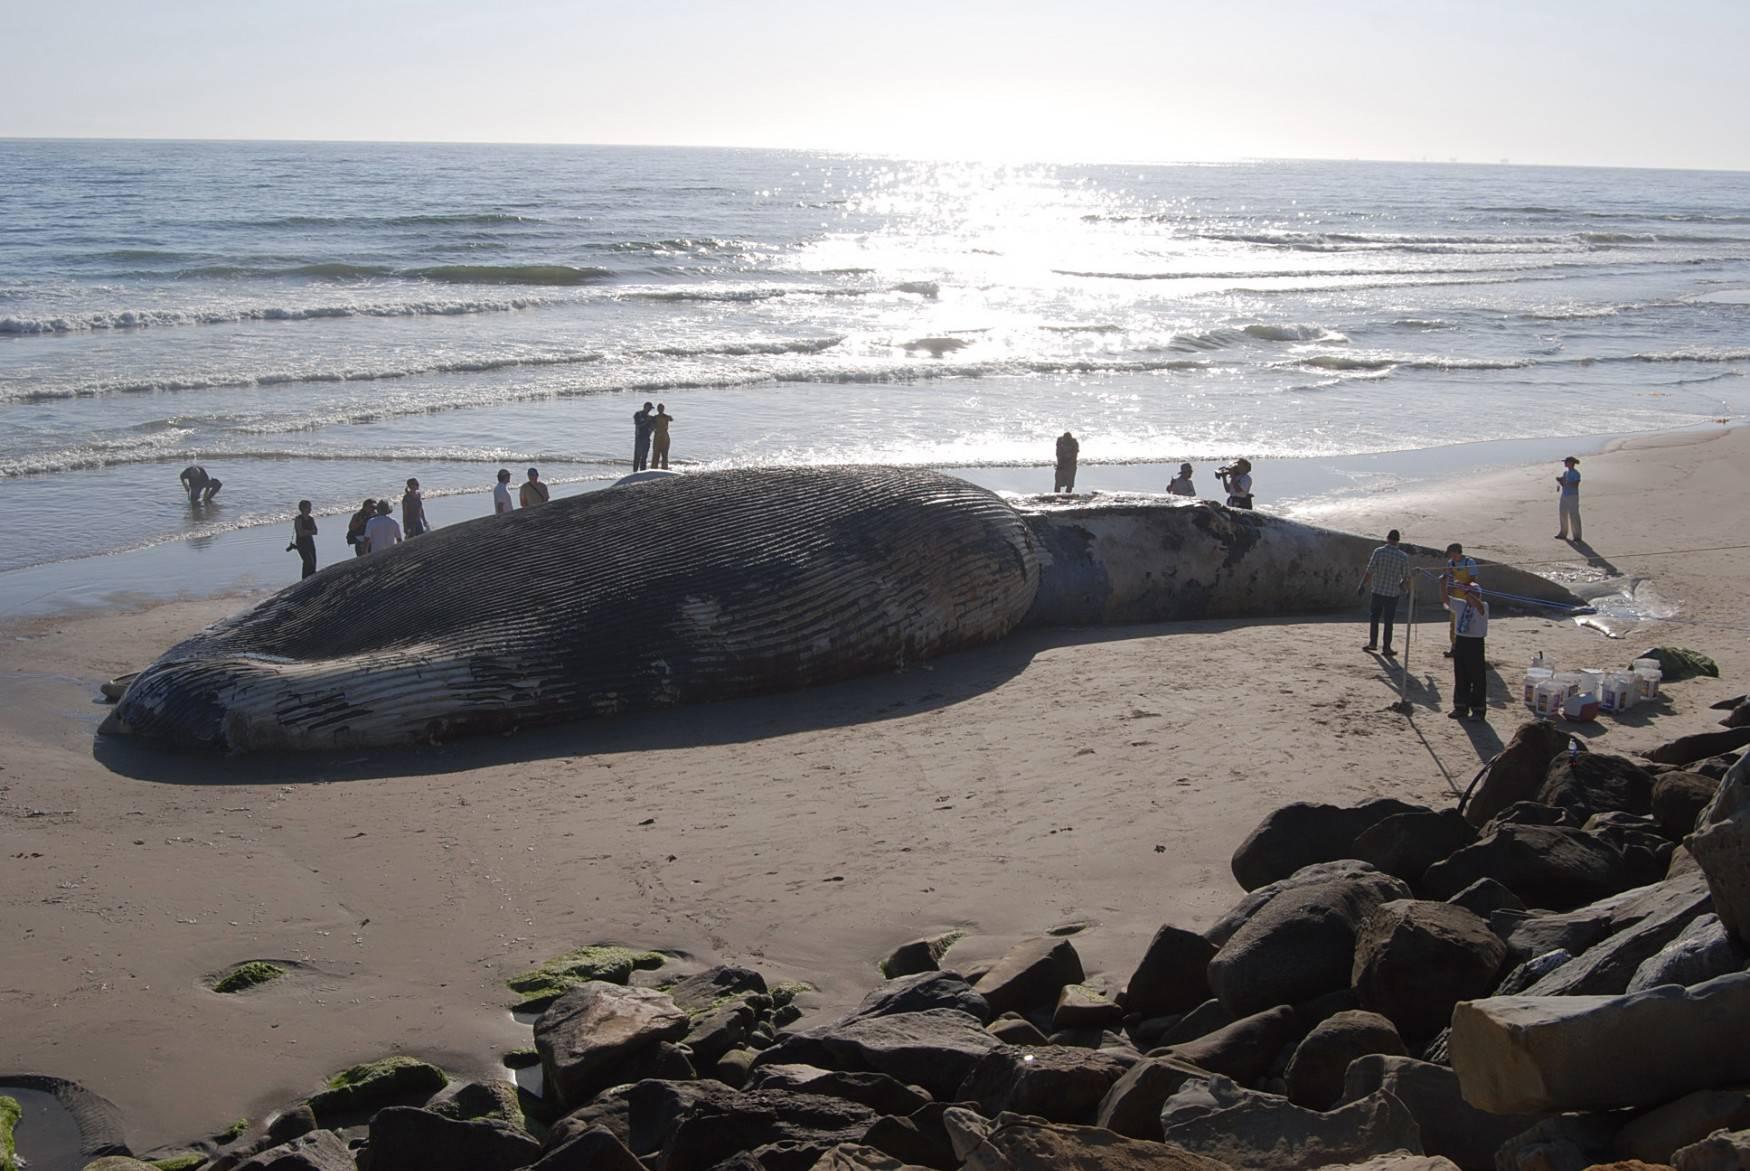 Beach whale rocks people wallpaper HQ WALLPAPER   2512 1750x1171